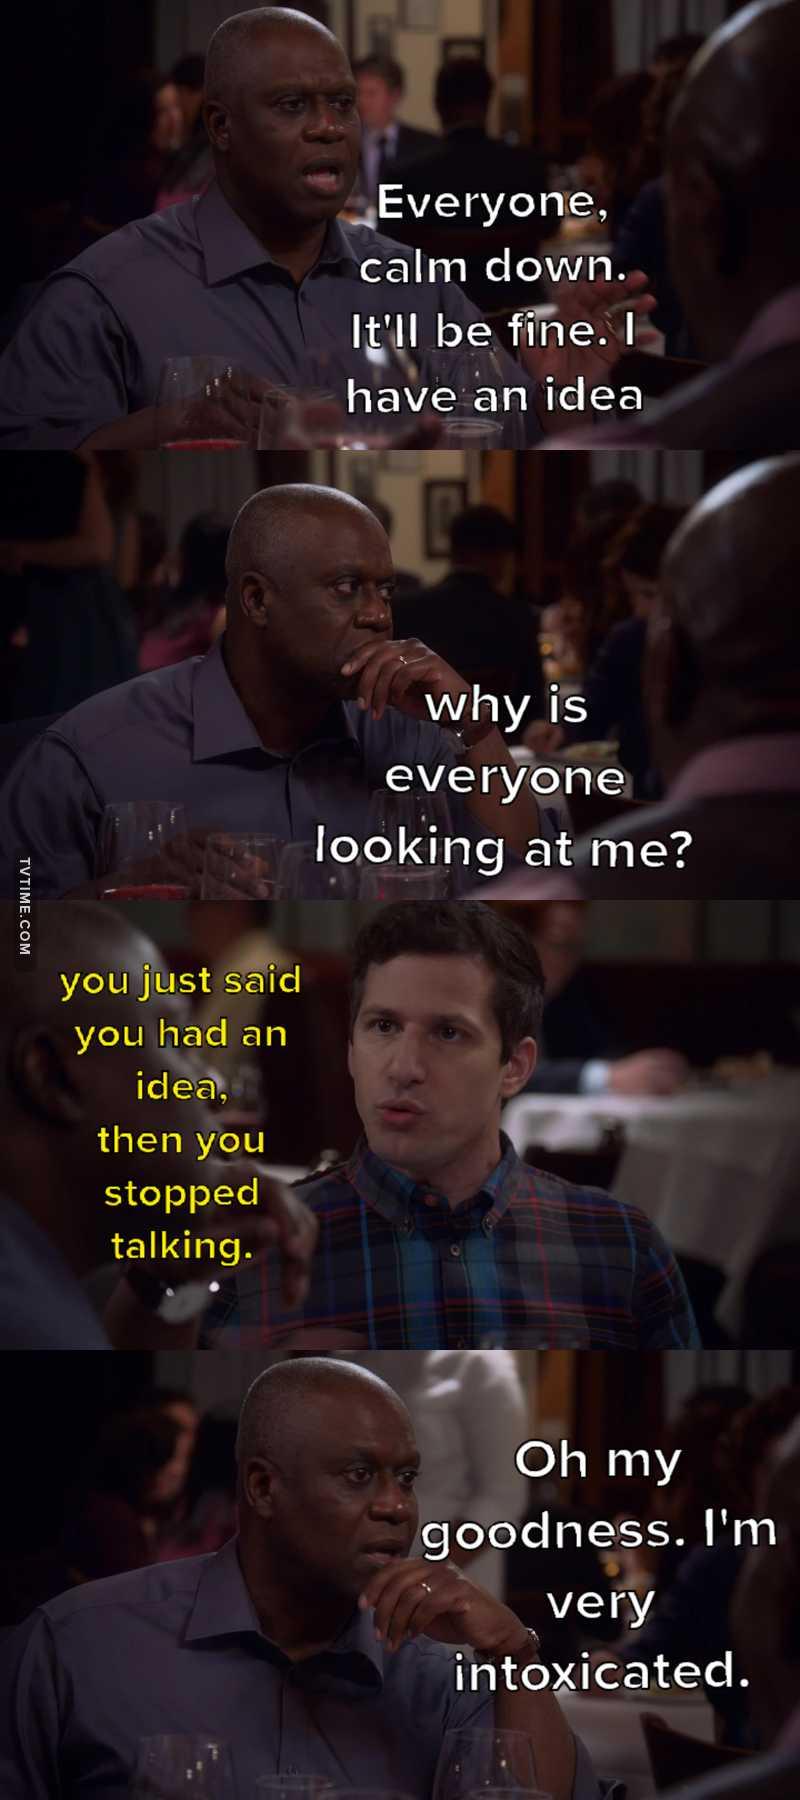 Bachelor Party Meme Generator